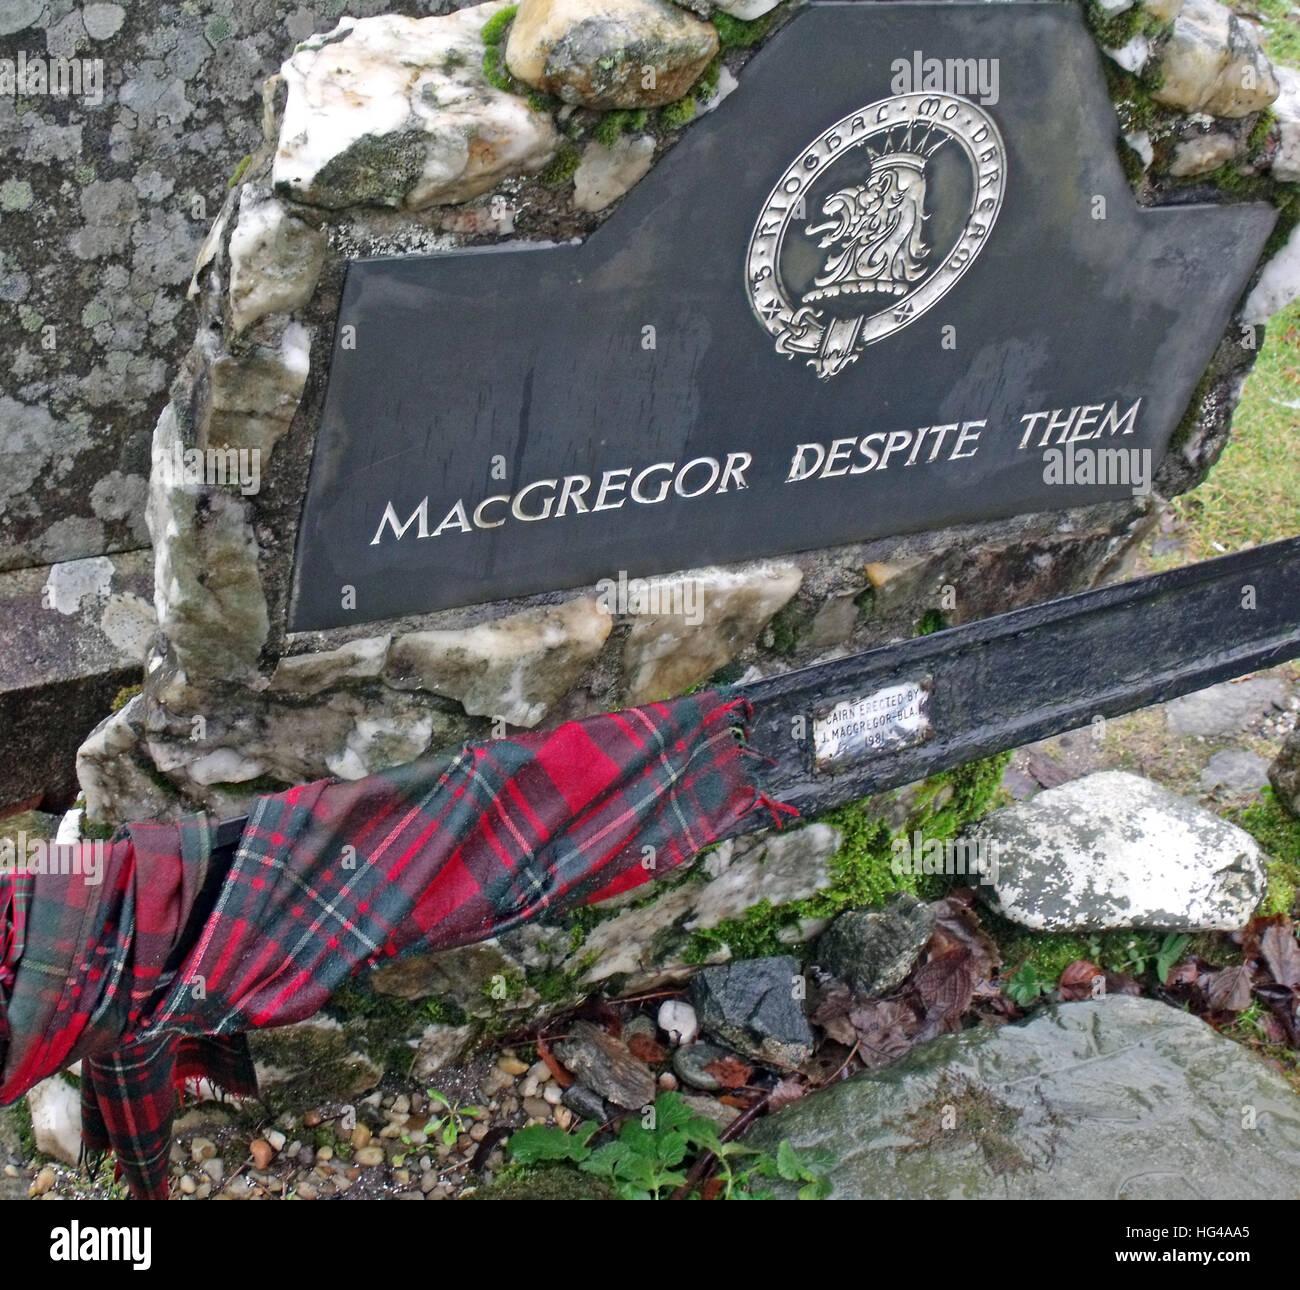 Nationalism,Roy,MacGregor,red,hair,haired,hero,martyr,outlaw,Balquidder,Inverlochlarig,Beg,graveyard,burial,buried,tomb,Robert,MacGregor,slate,MacGregor,Despite,Them,tarten,tartan,crest,Scottish